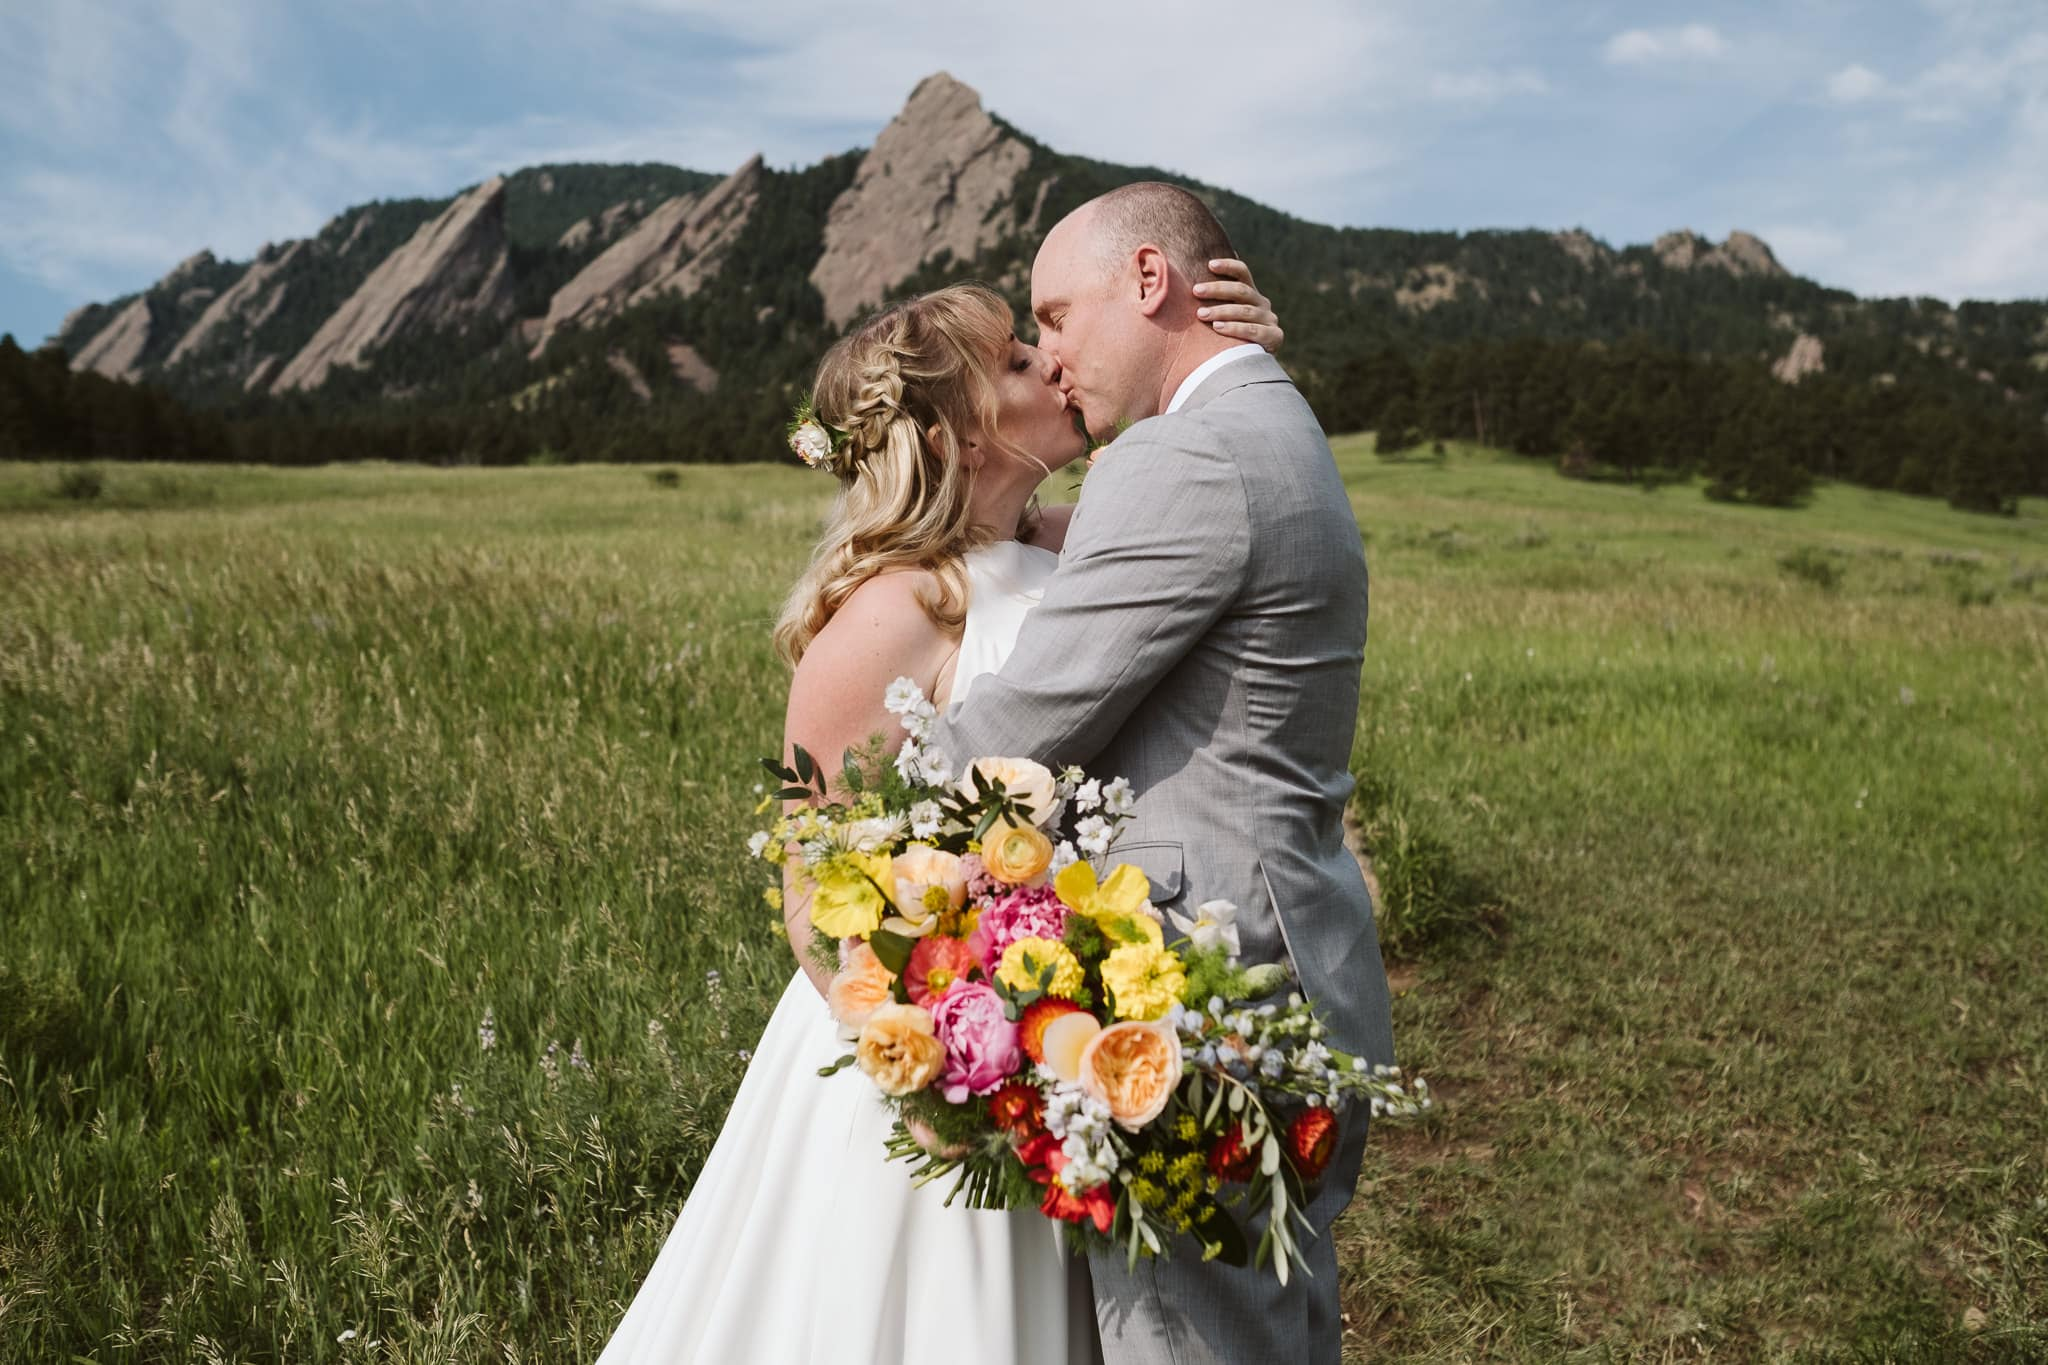 Chautauqua Park wedding photos